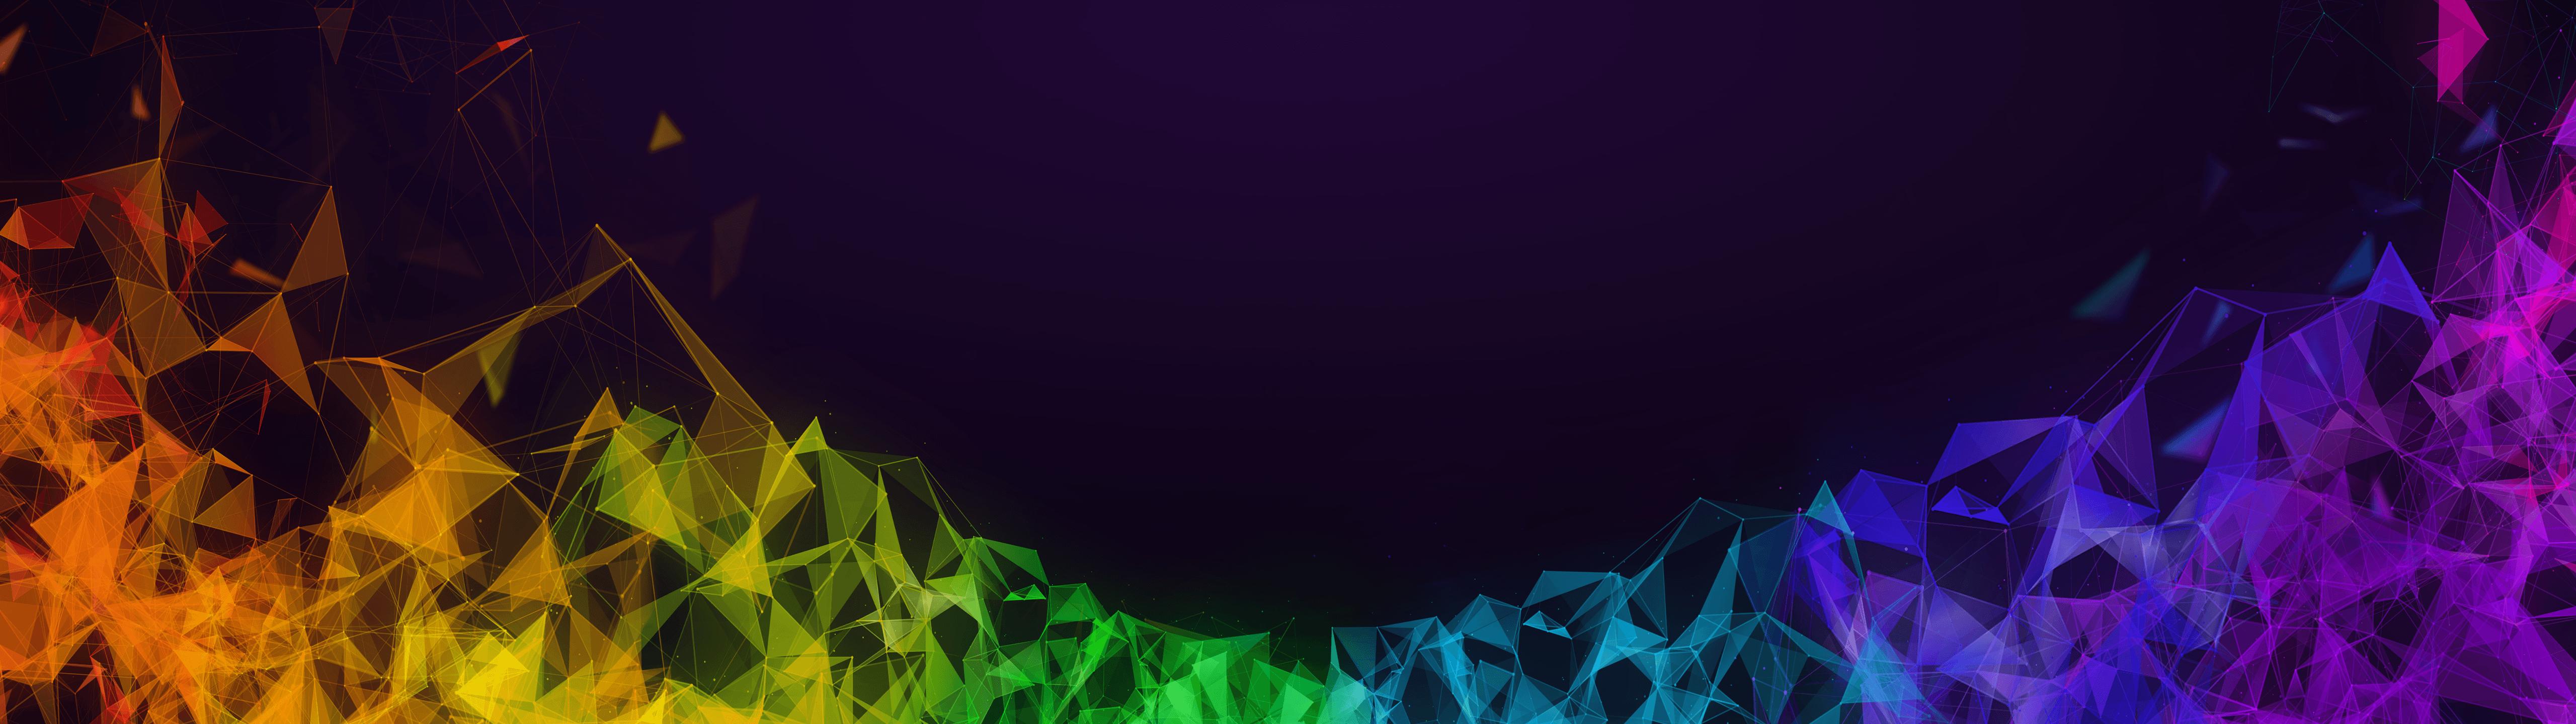 Prism Razer Wallpapers - Wallpaper Cave